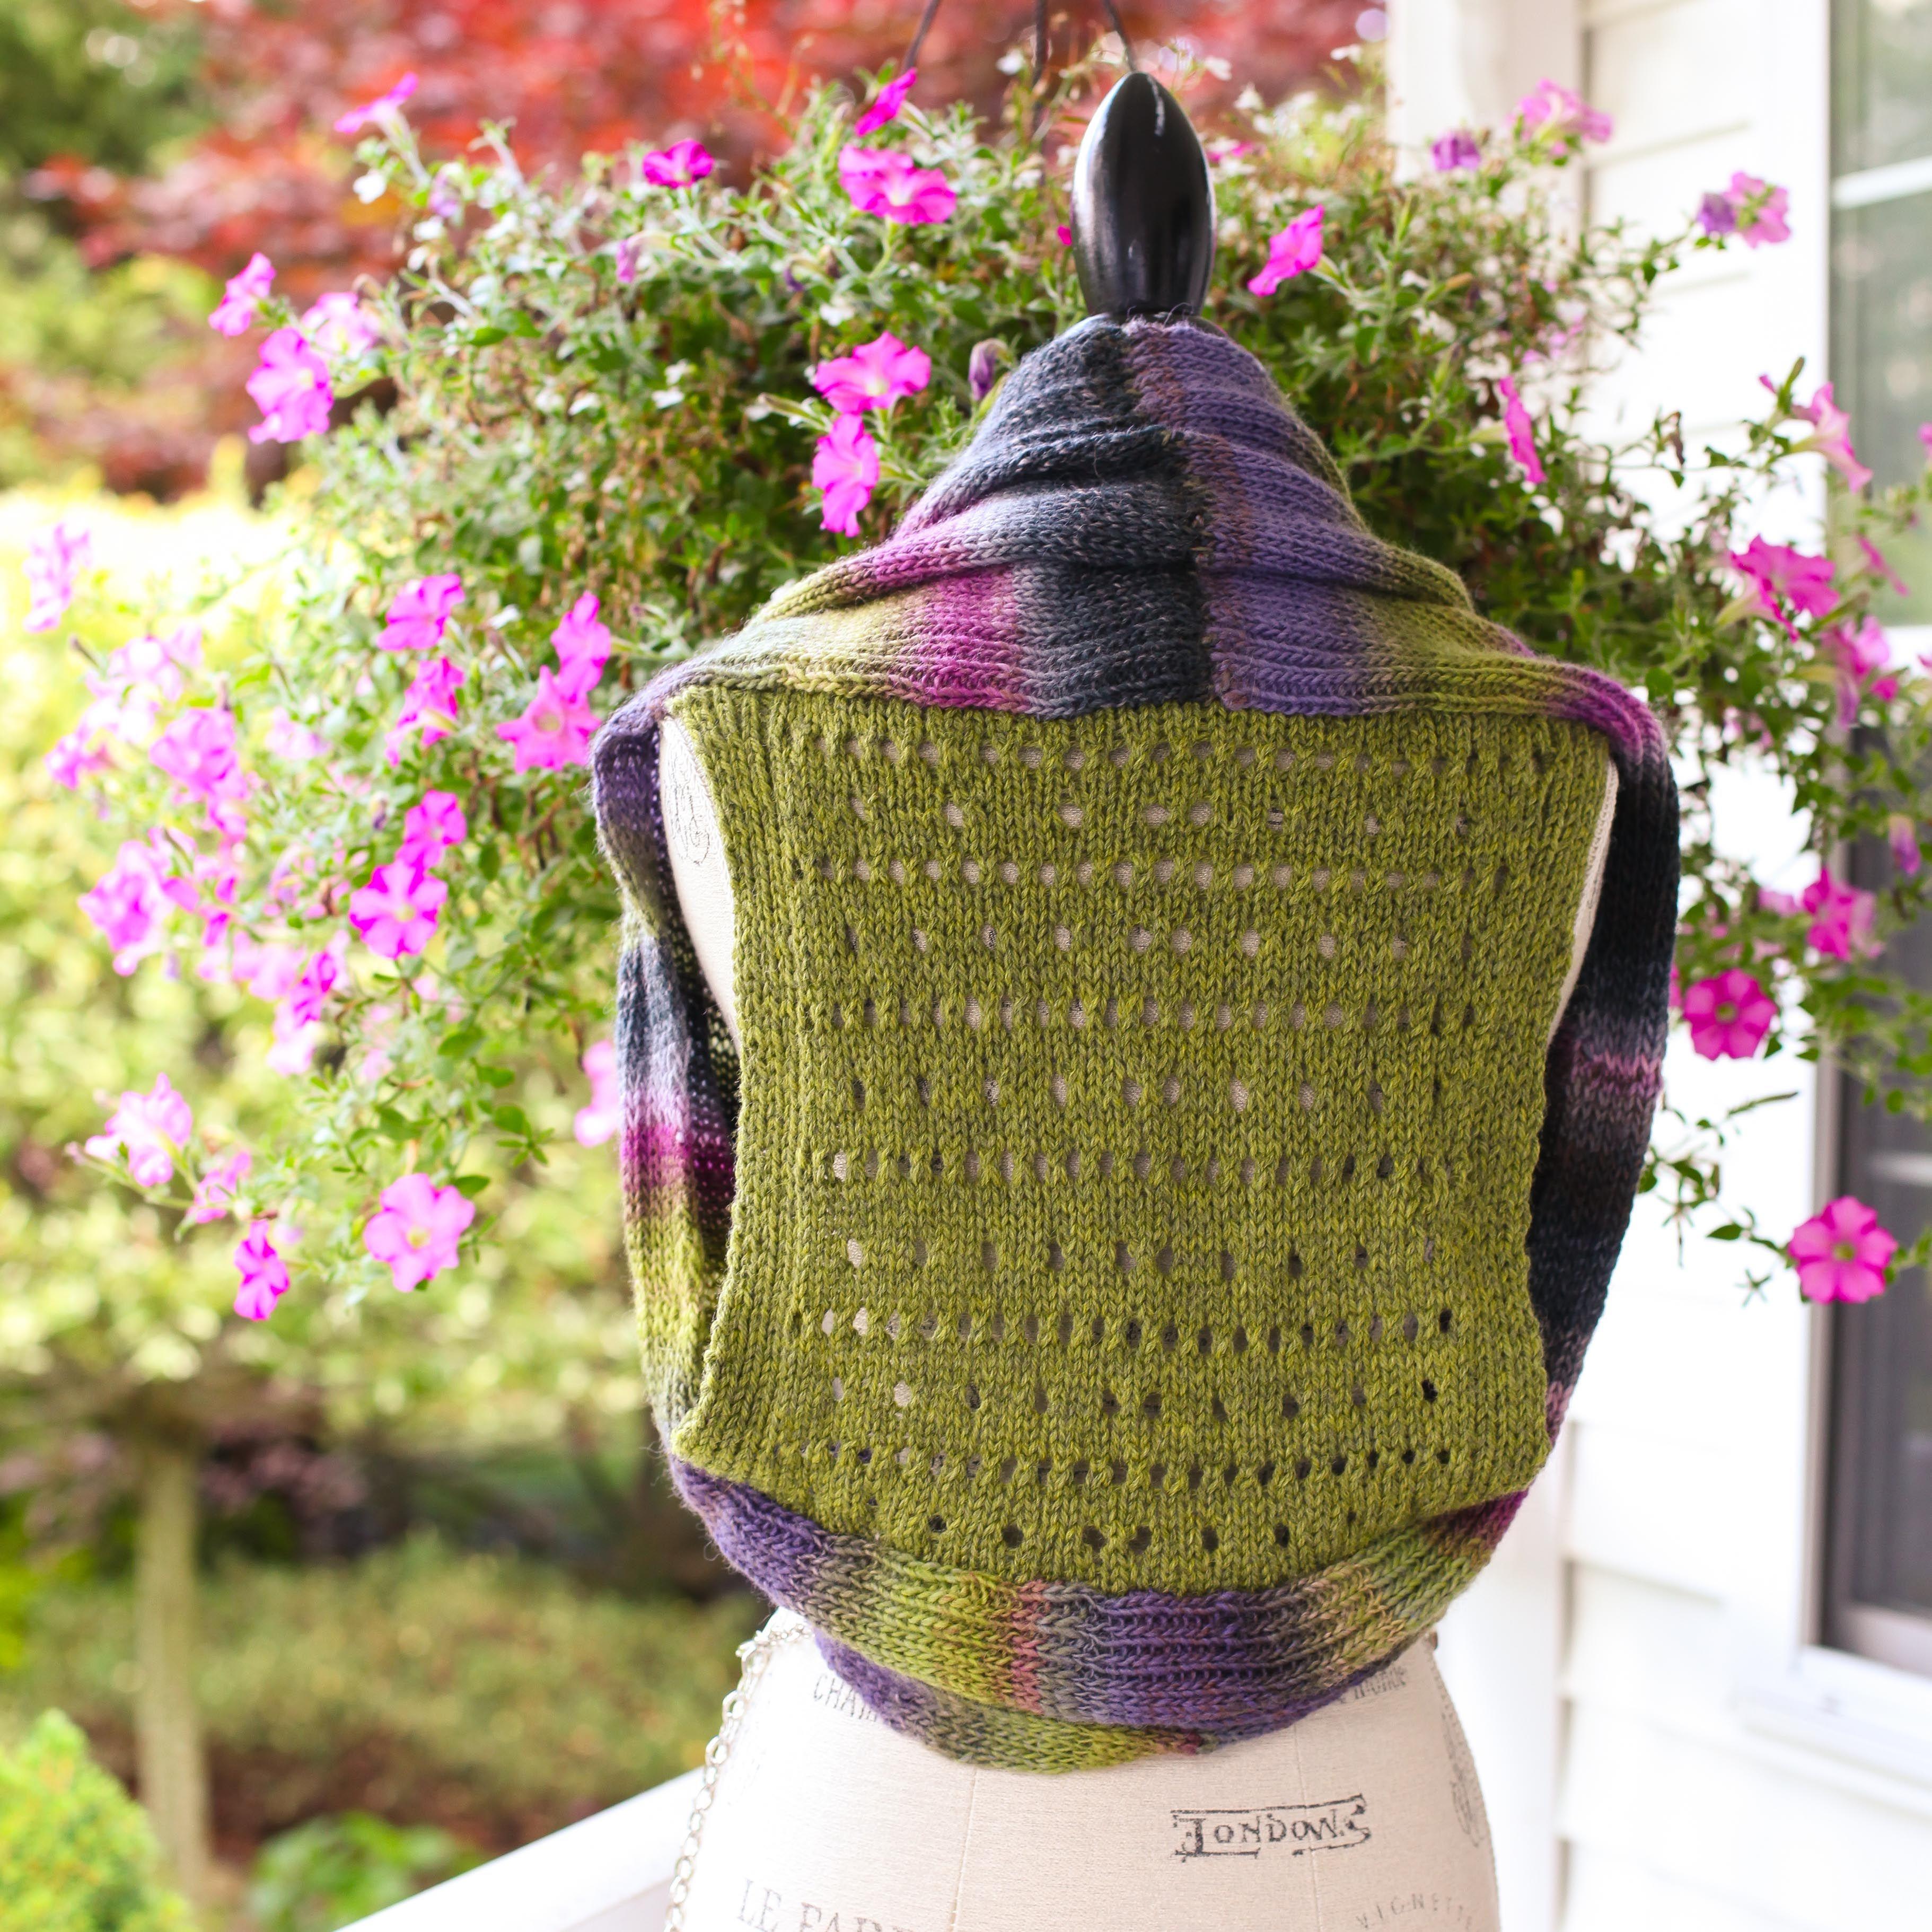 461c398cf57 Loom Knit Shrug Vest Pattern. Vest Has A Pretty Eyelet Lace Back ...